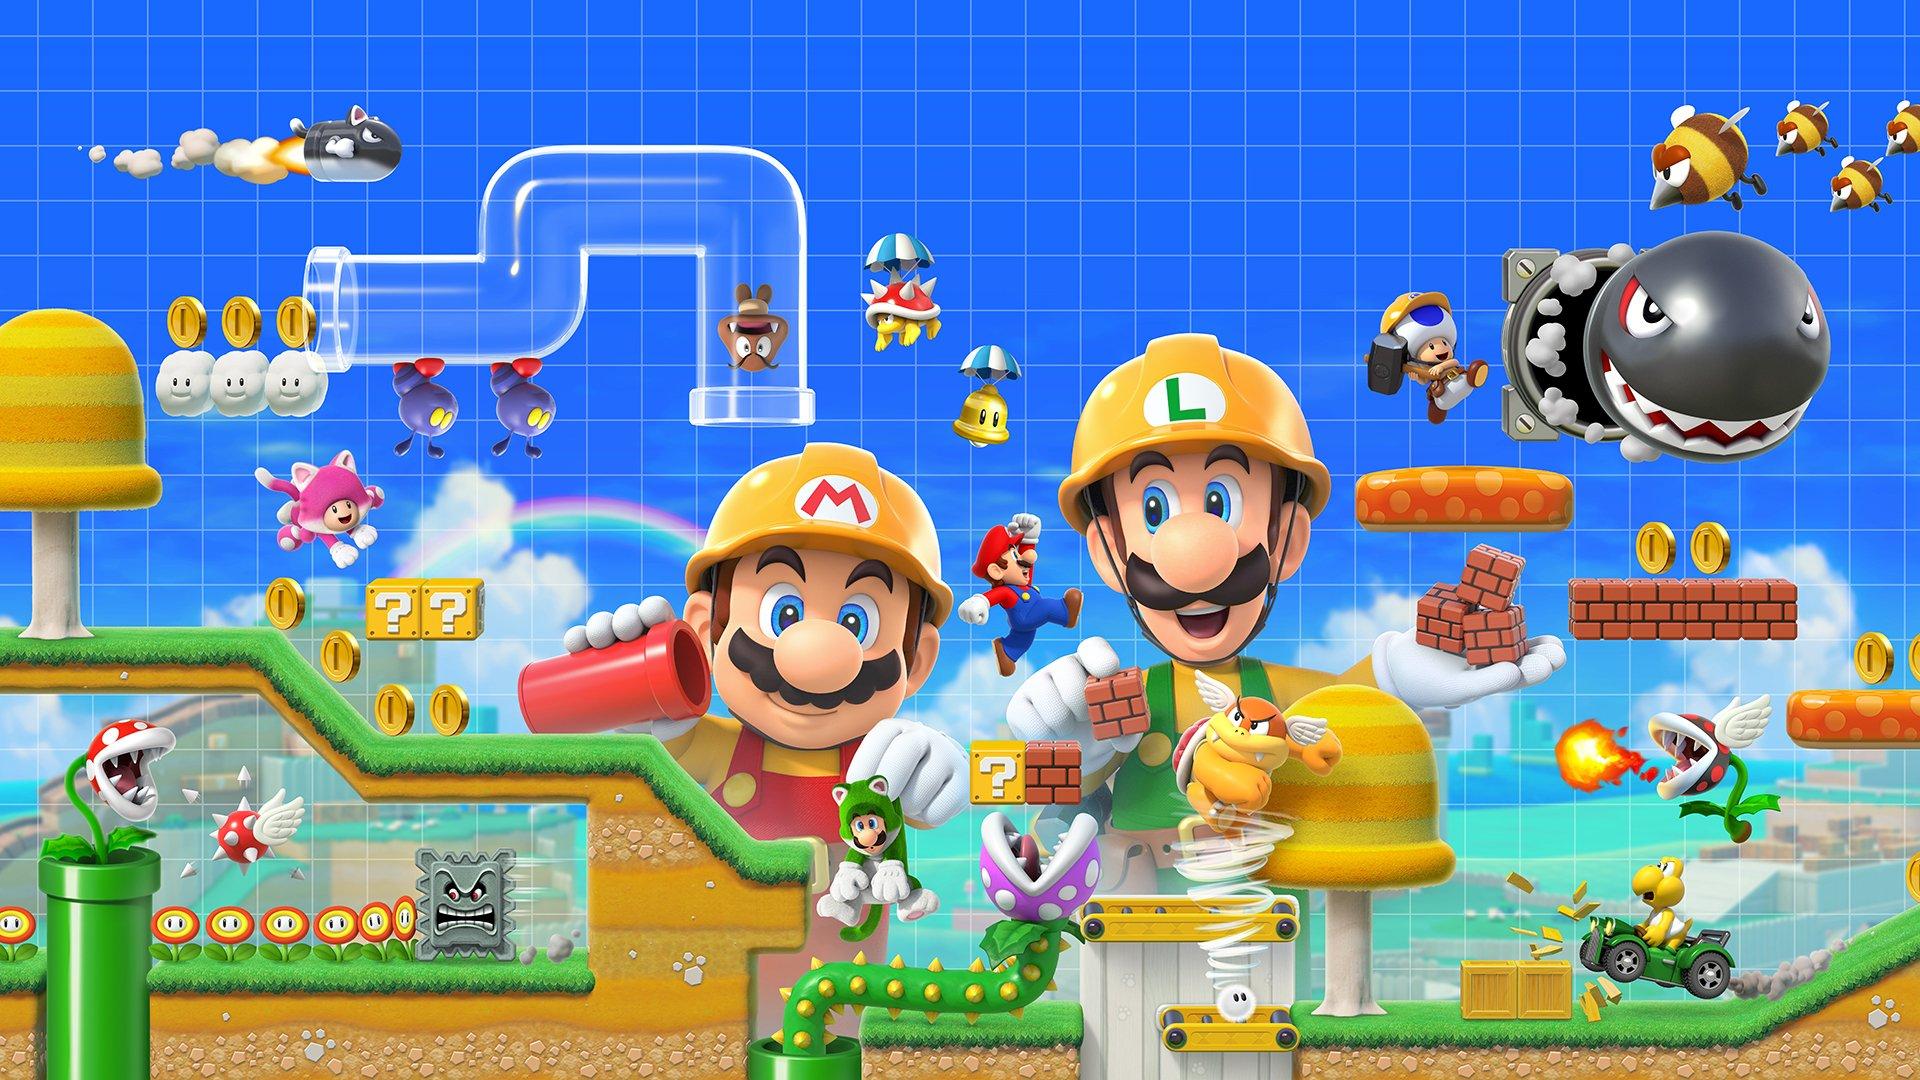 Nintendo Direct Highlights The Legend Of Zelda Links Awakening